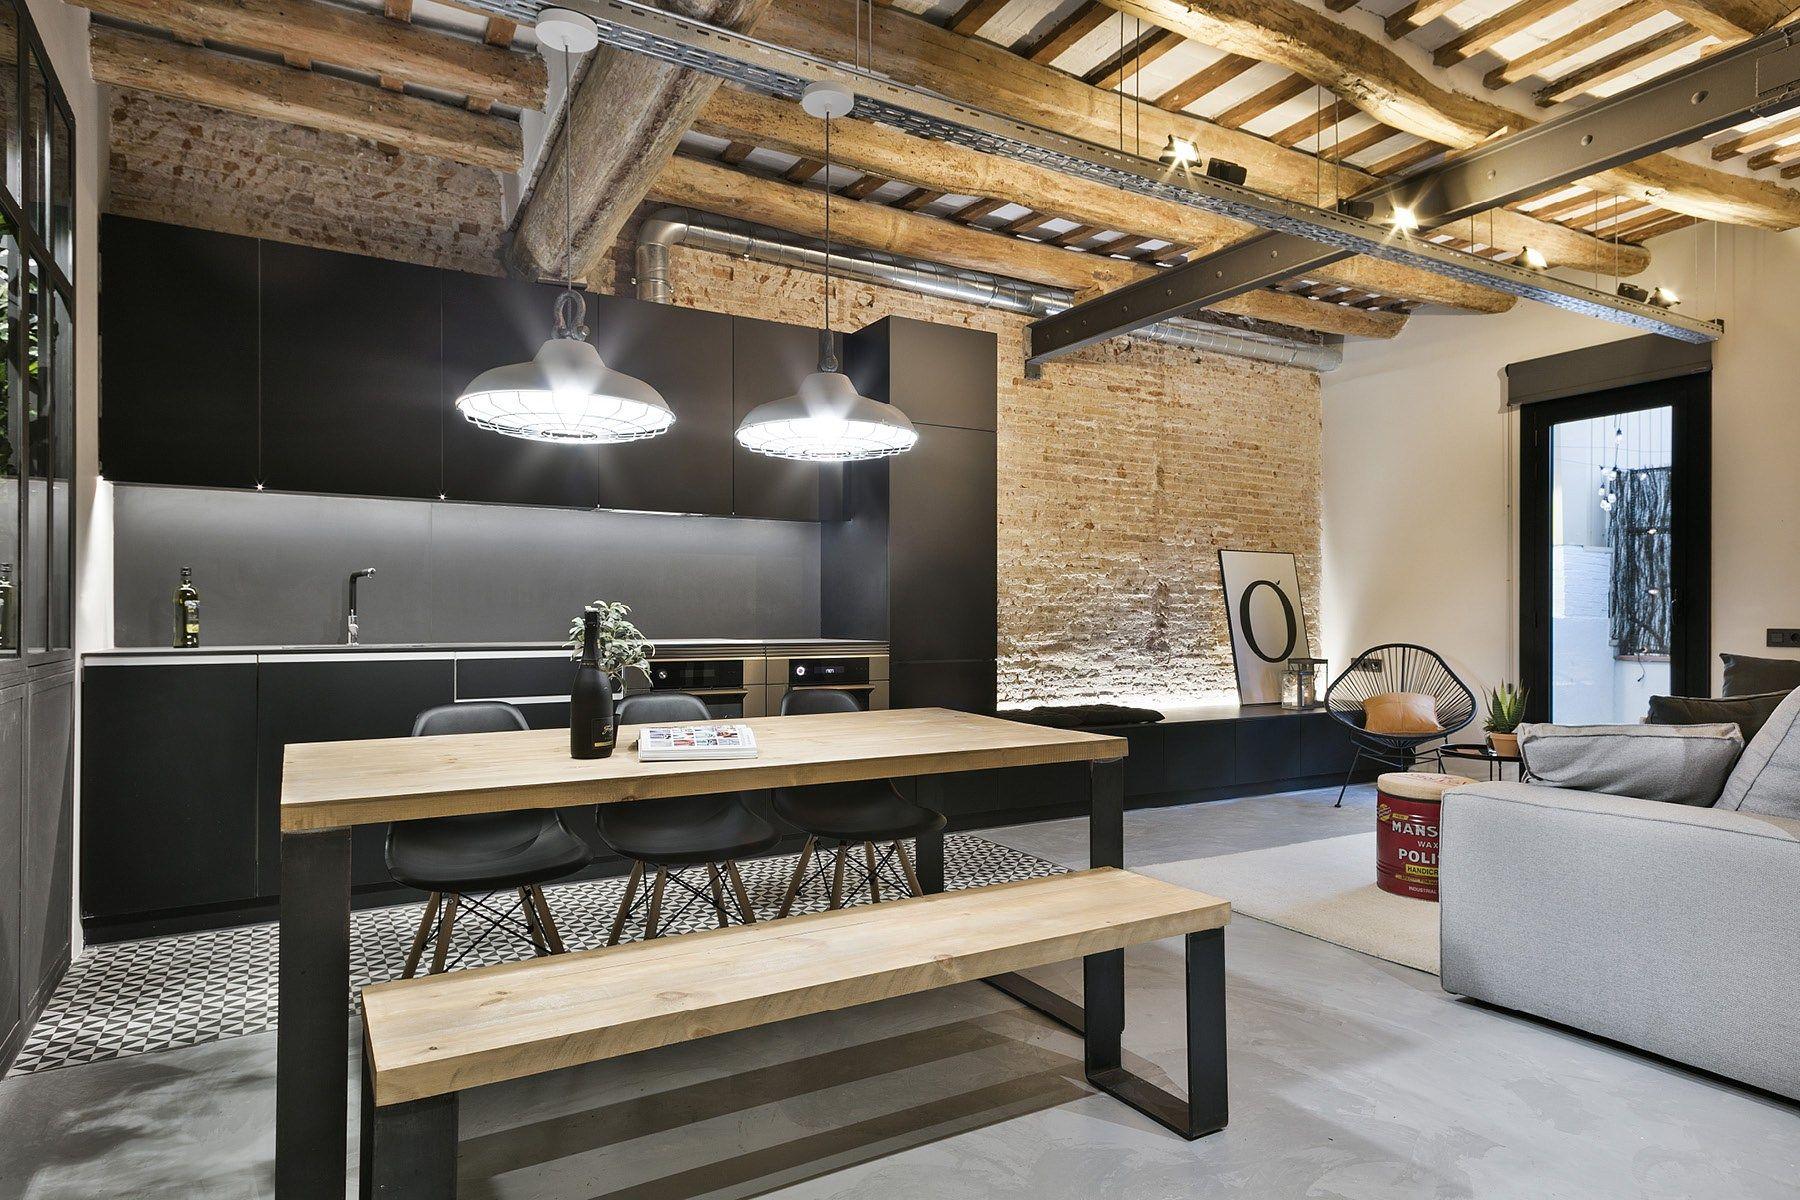 modernos reformas barcelona piso difano interiores espacios difanos diseo decoracion interiores decoracin pisos pequeos decoracin